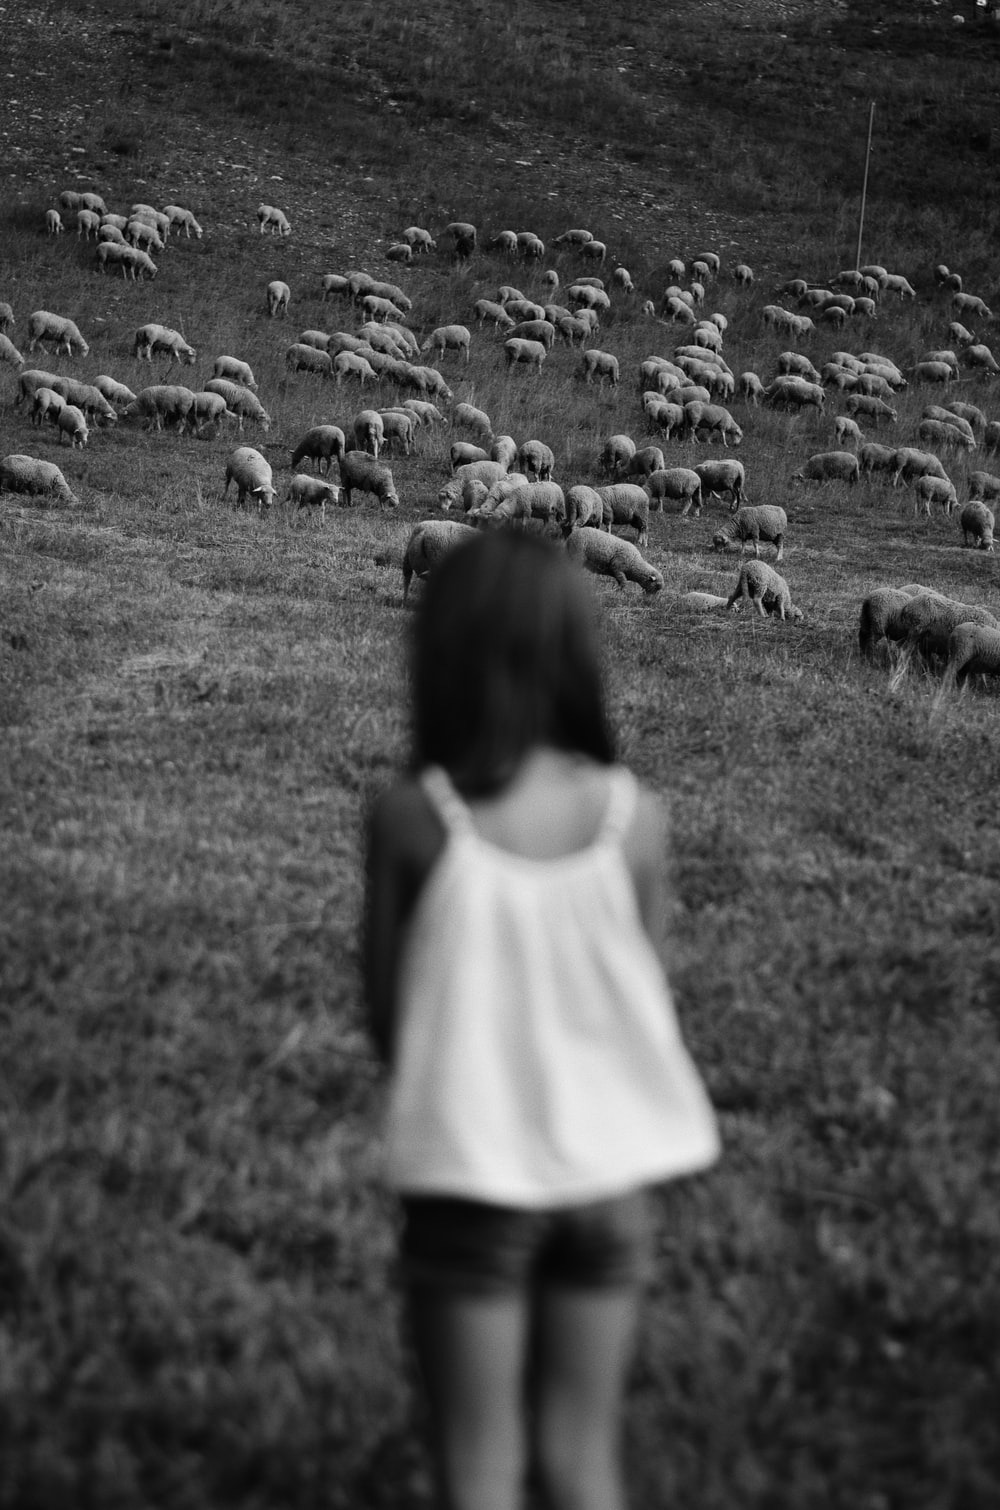 girl in white dress standing on grass field